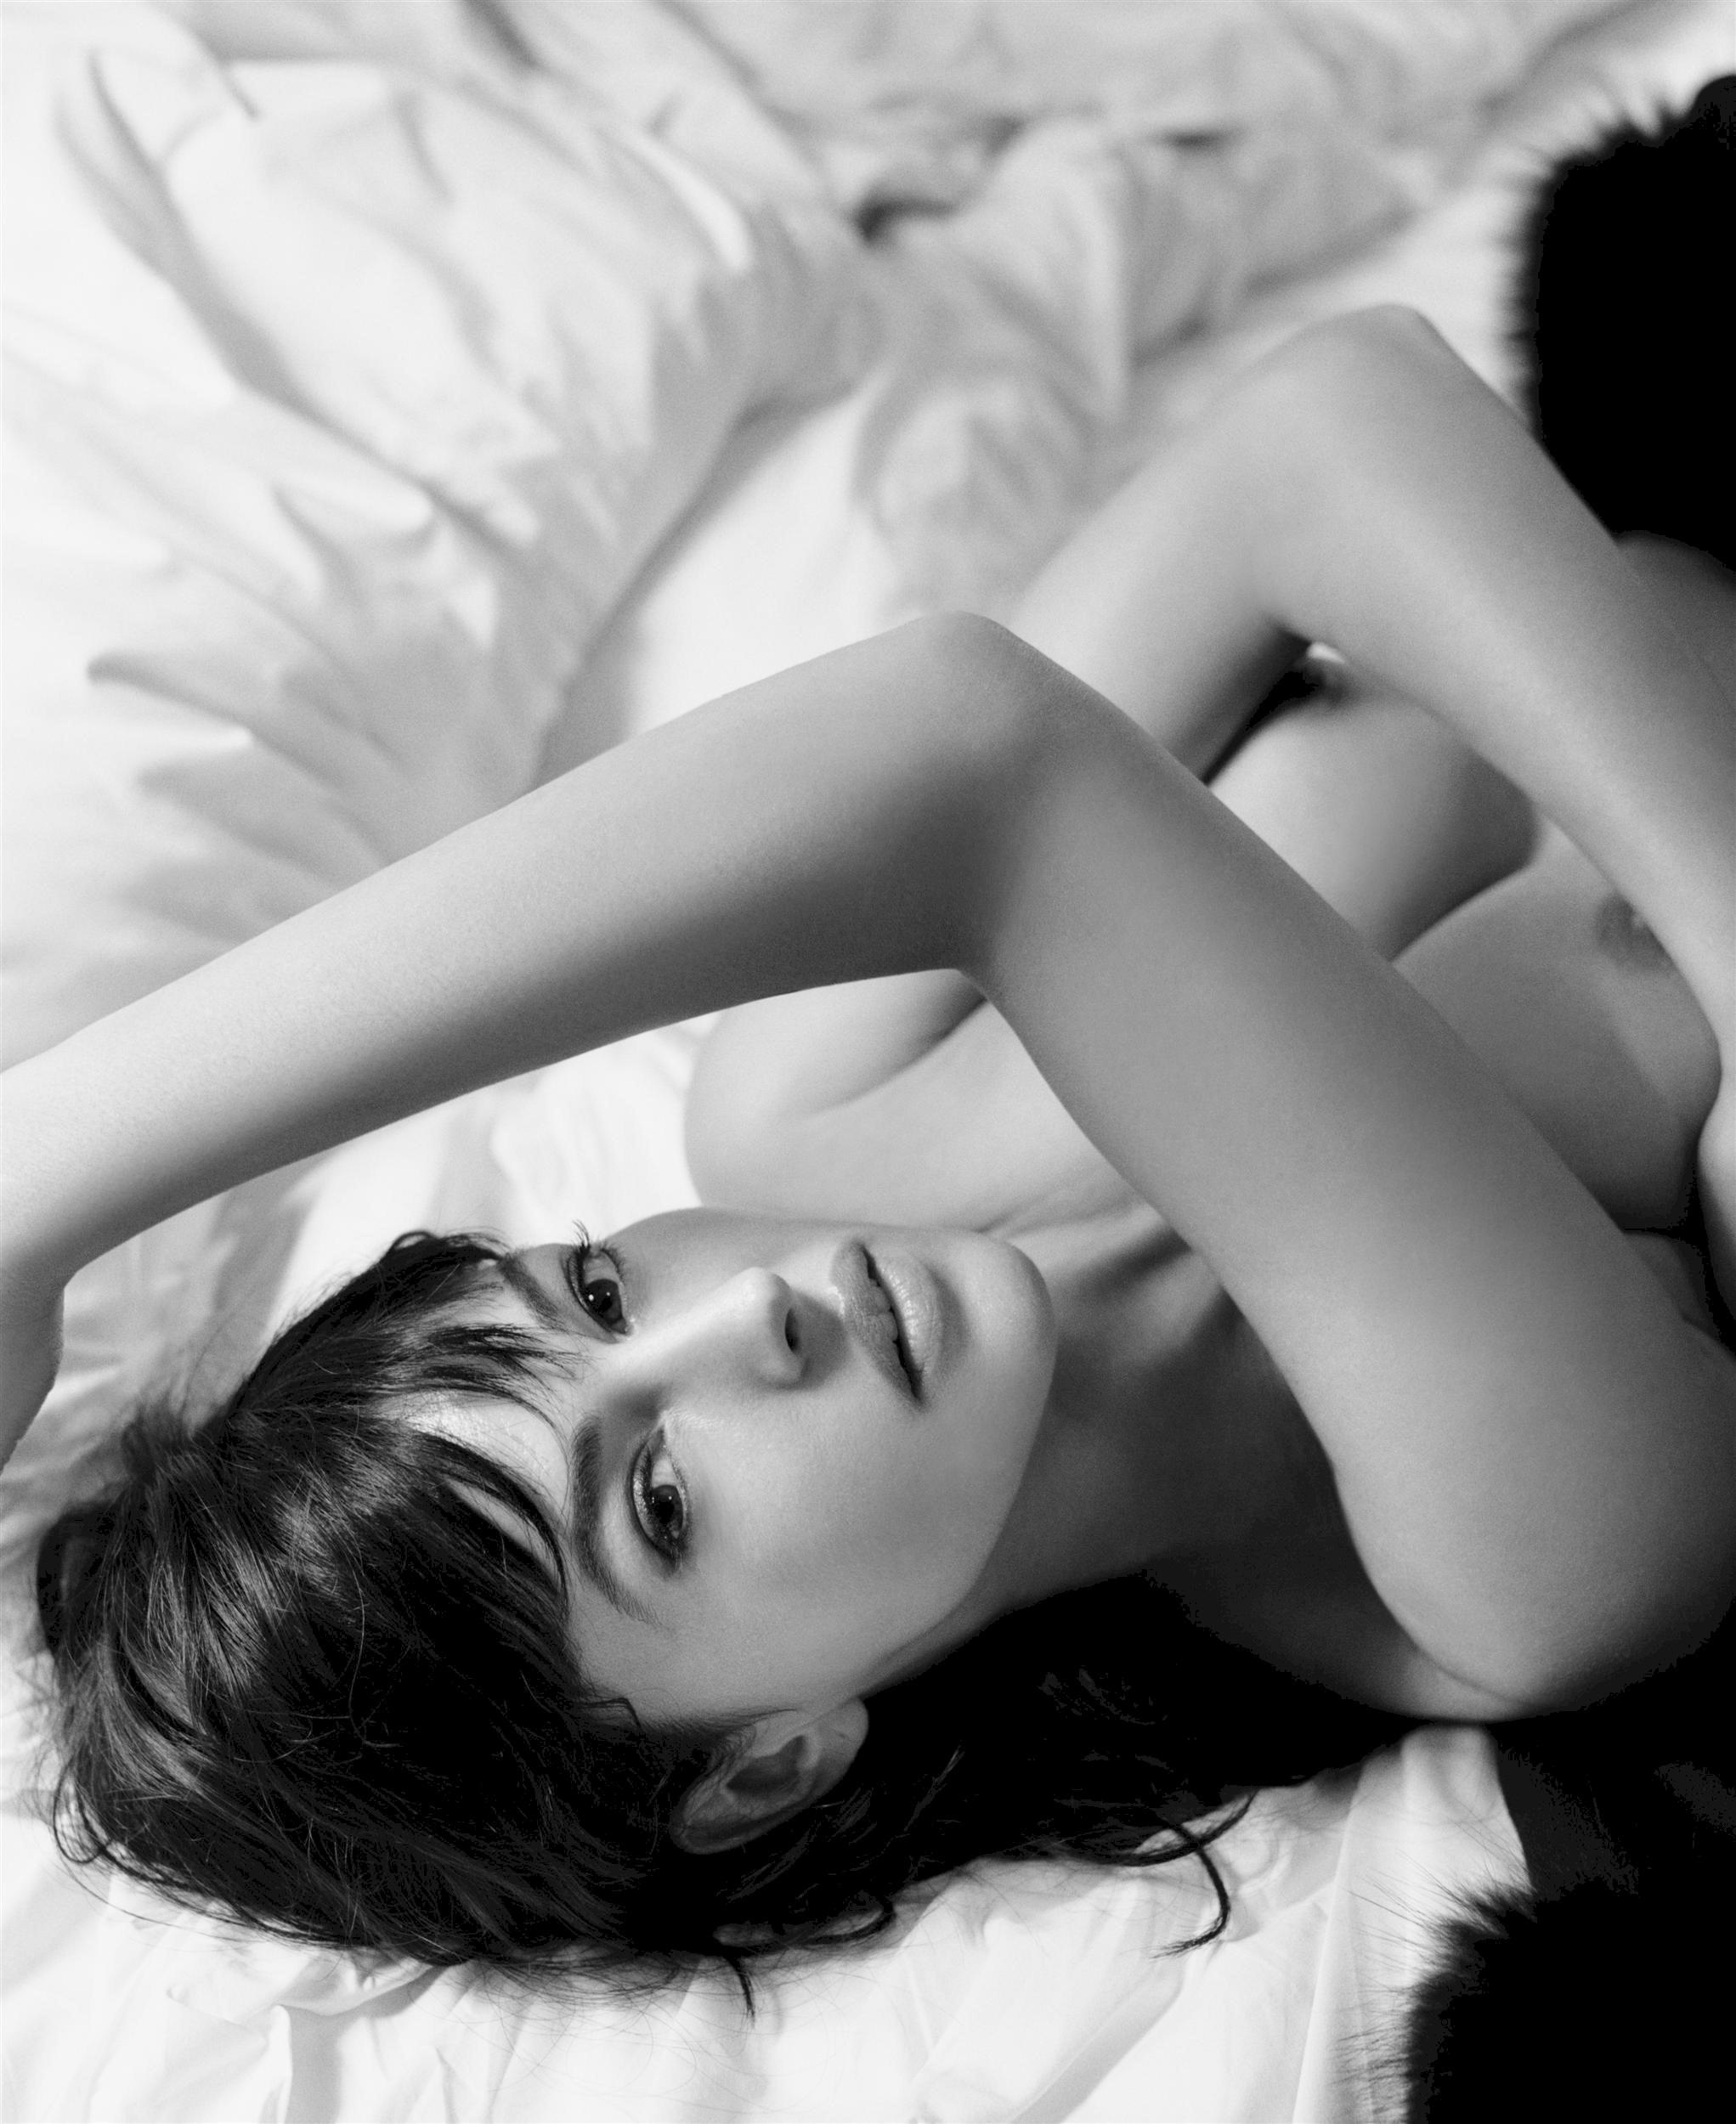 2043x2500, 617 Kb / ч/б, Monica Bellucci, постель, моника беллуччи